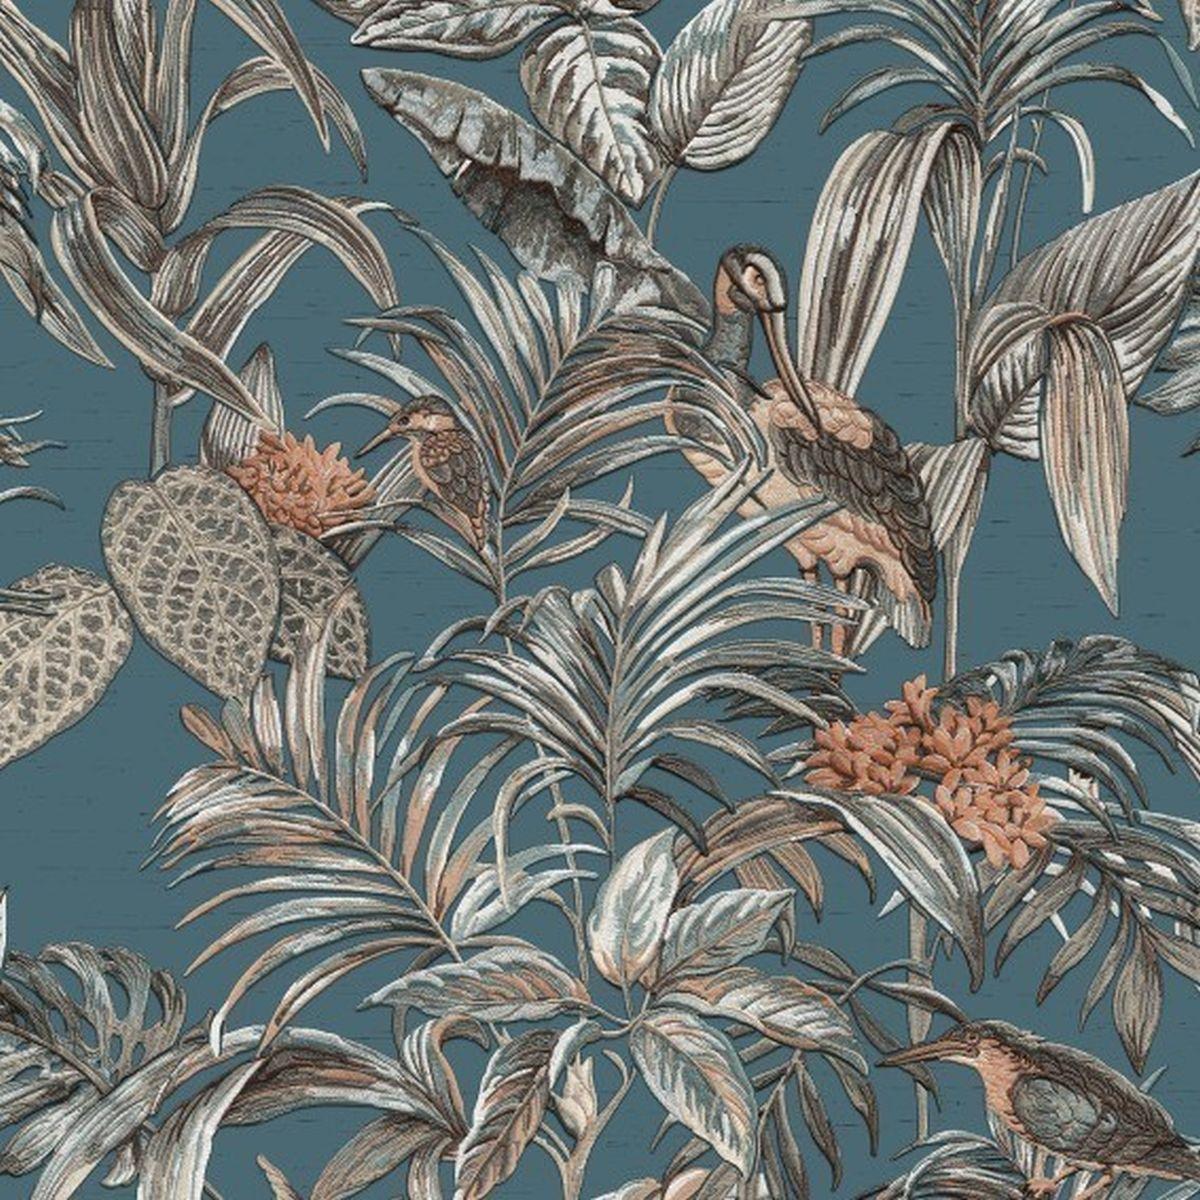 DesignID Vliestapete Erstklassige Wandbekleidung DE120016 Blau Blumentapete